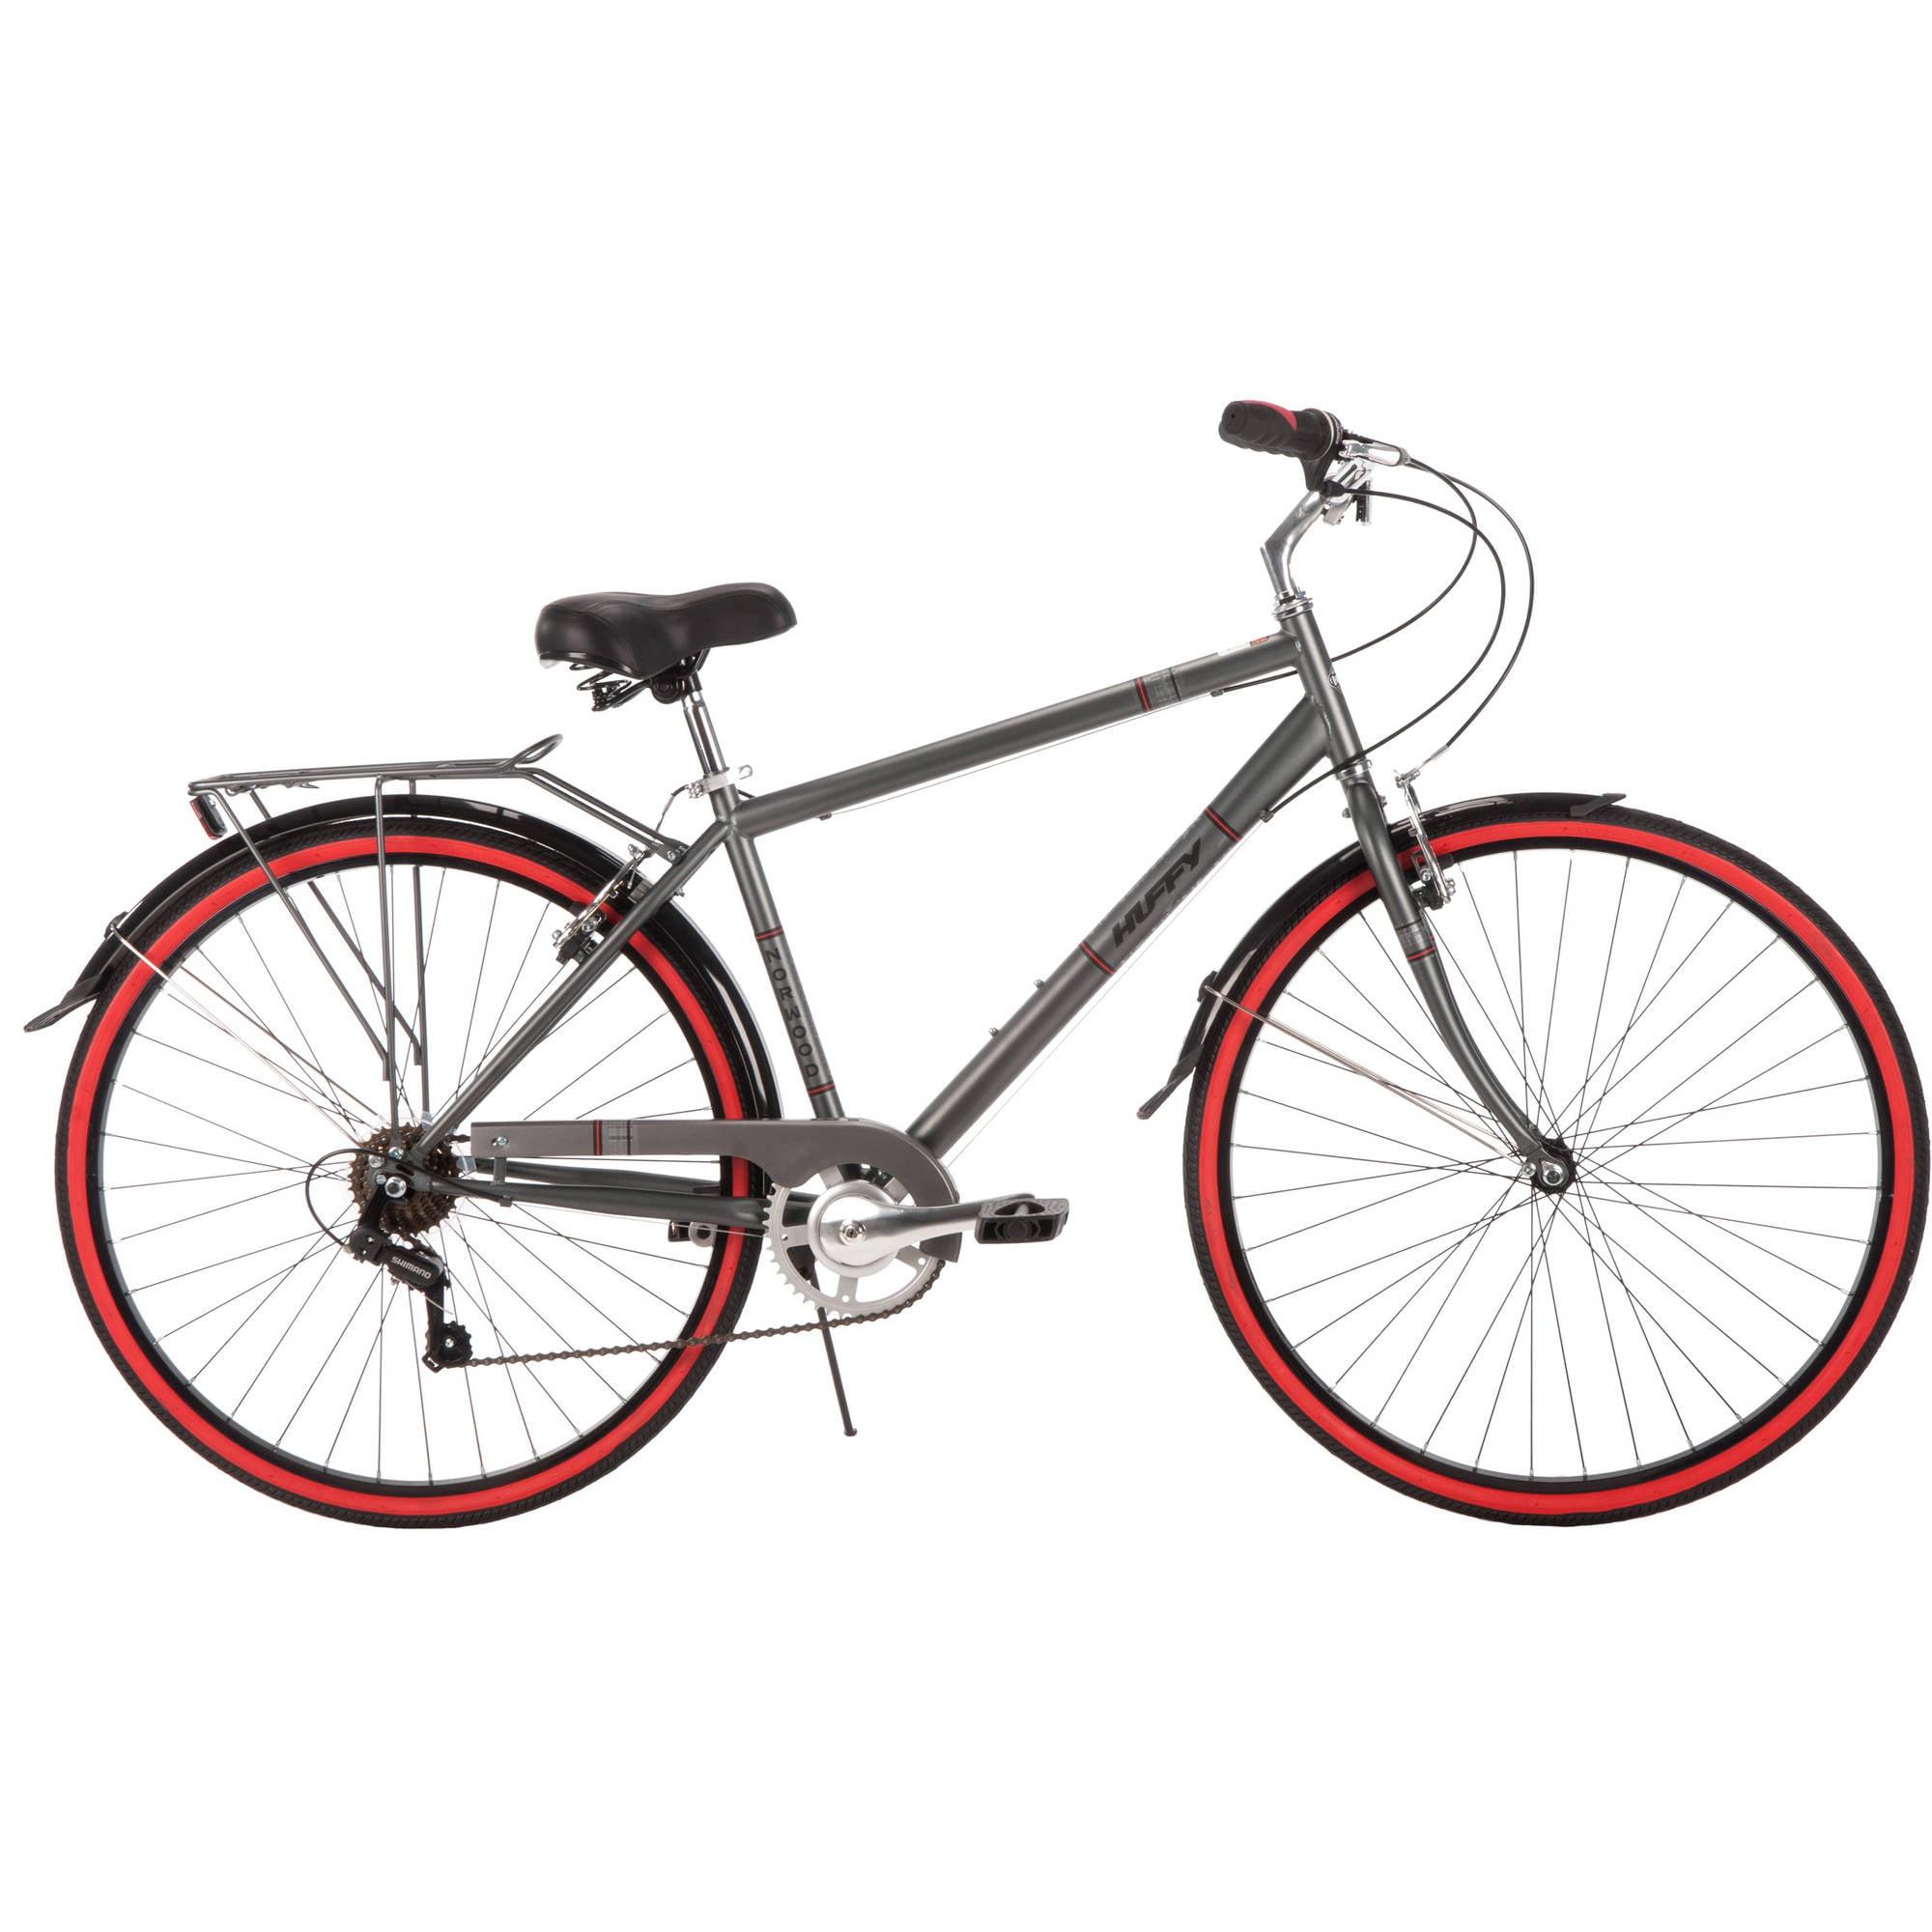 ea713a22ed2 700C Huffy Men's Norwood Cruiser Bike, Grey – Walmart Inventory ...